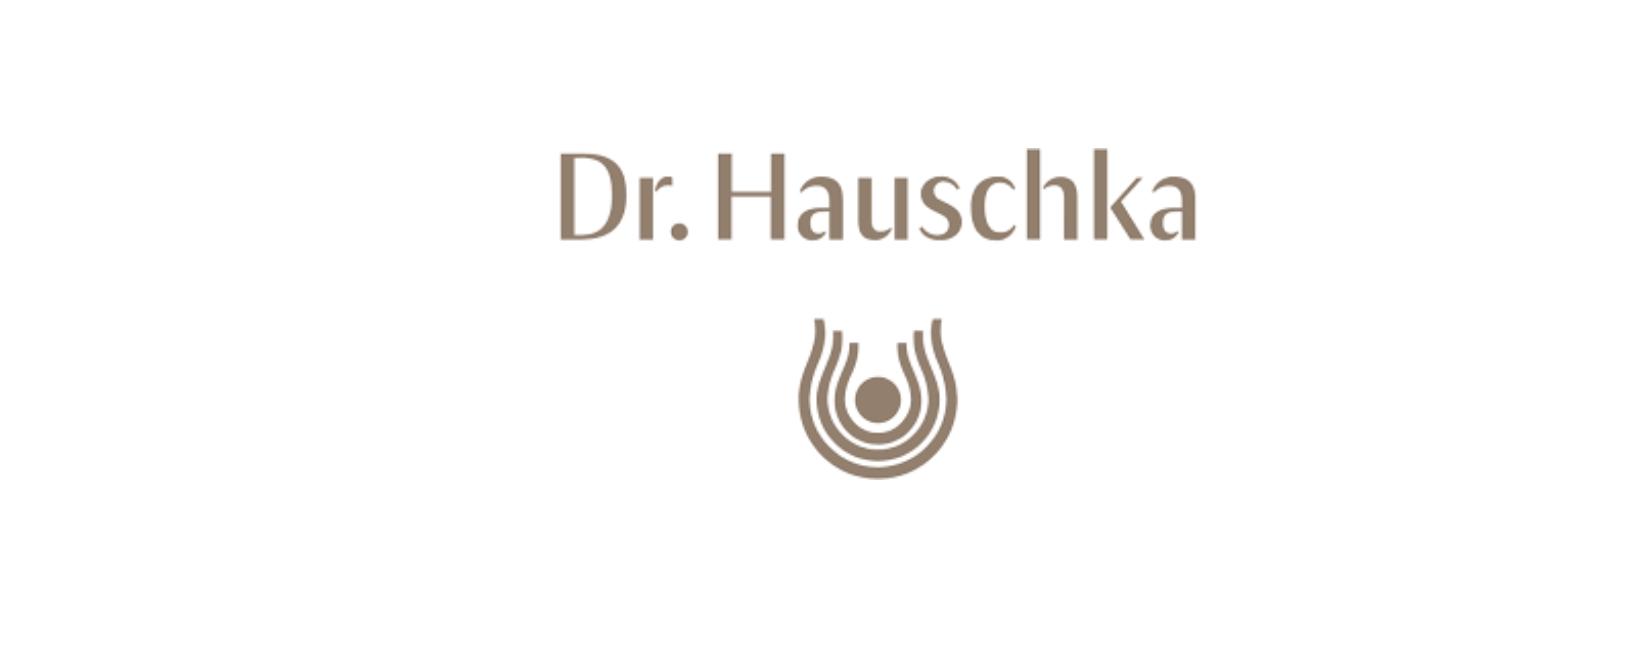 Dr. Hauschka Discount Code 2021